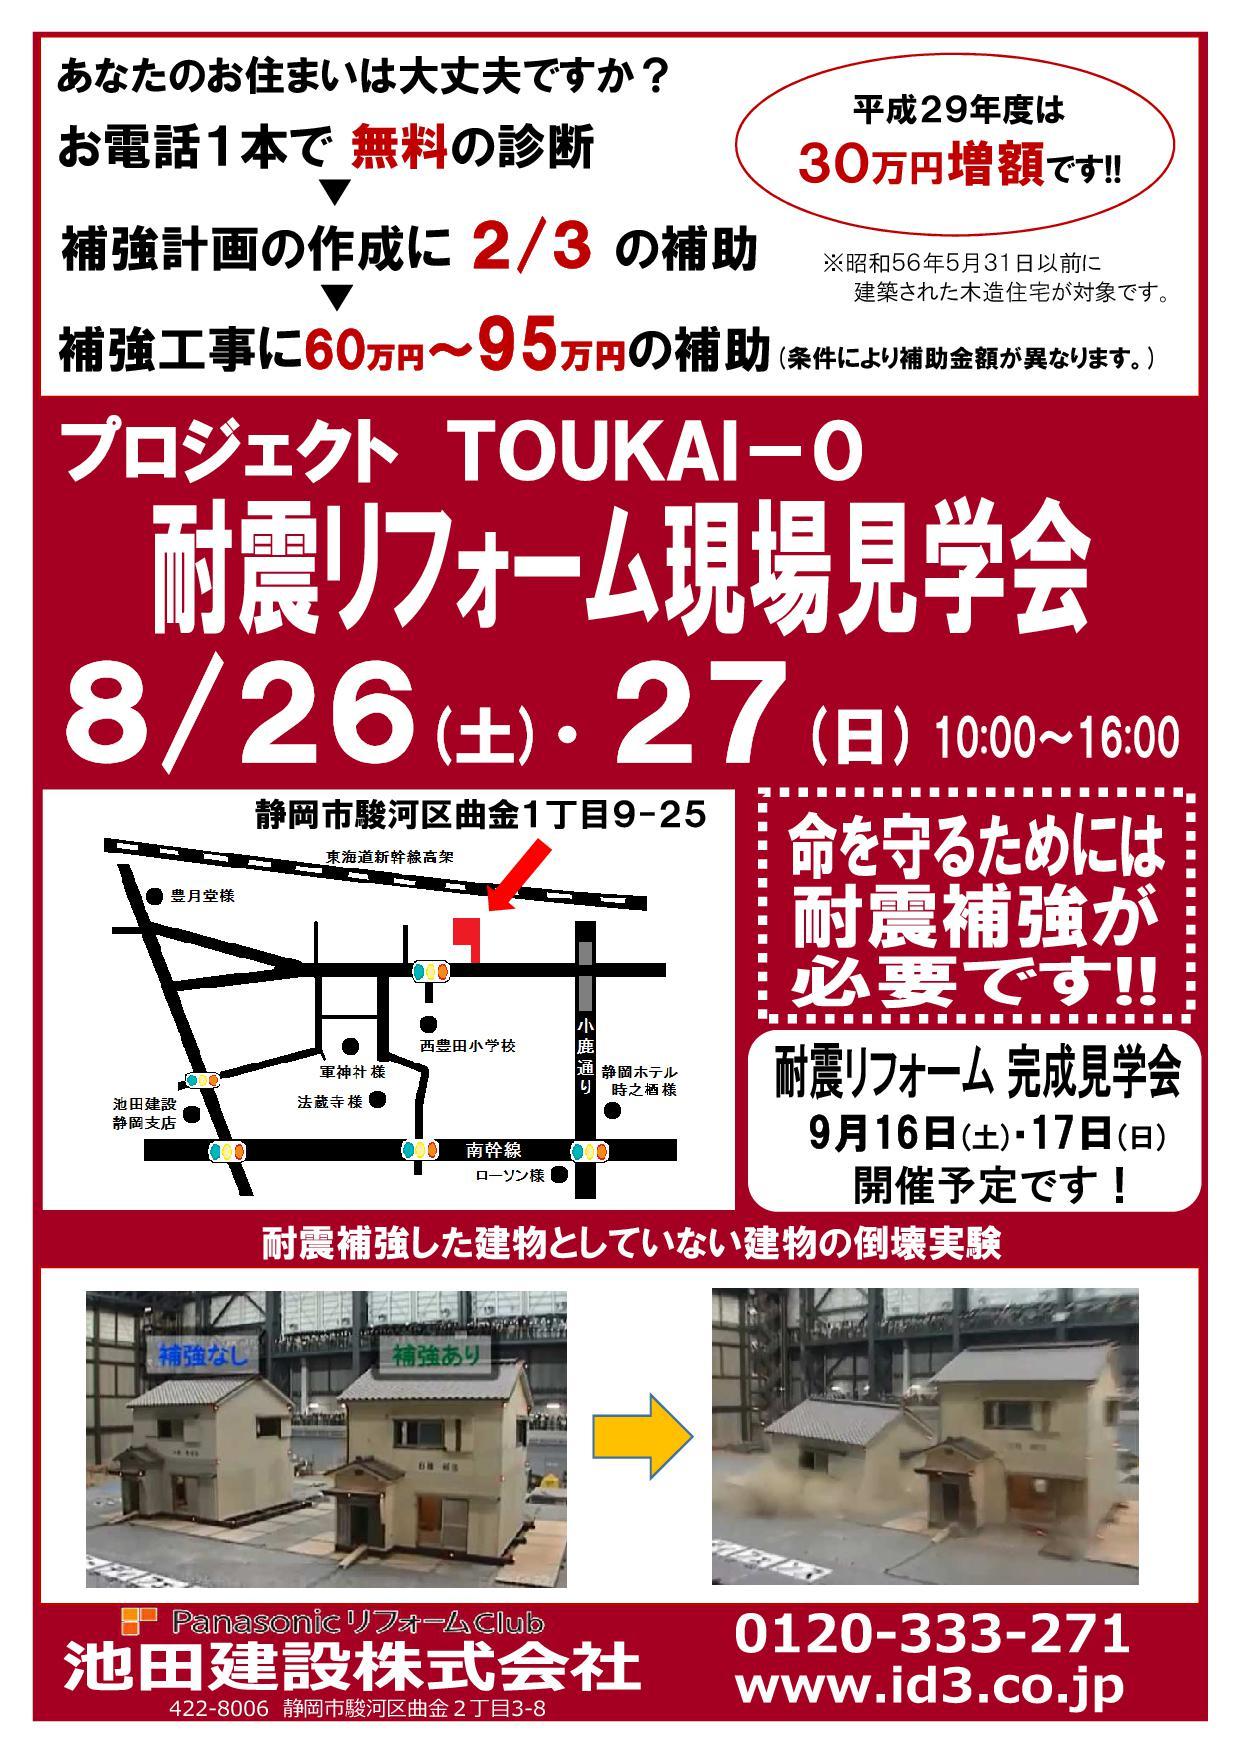 H29082627櫻井様邸耐震リフォーム見学会